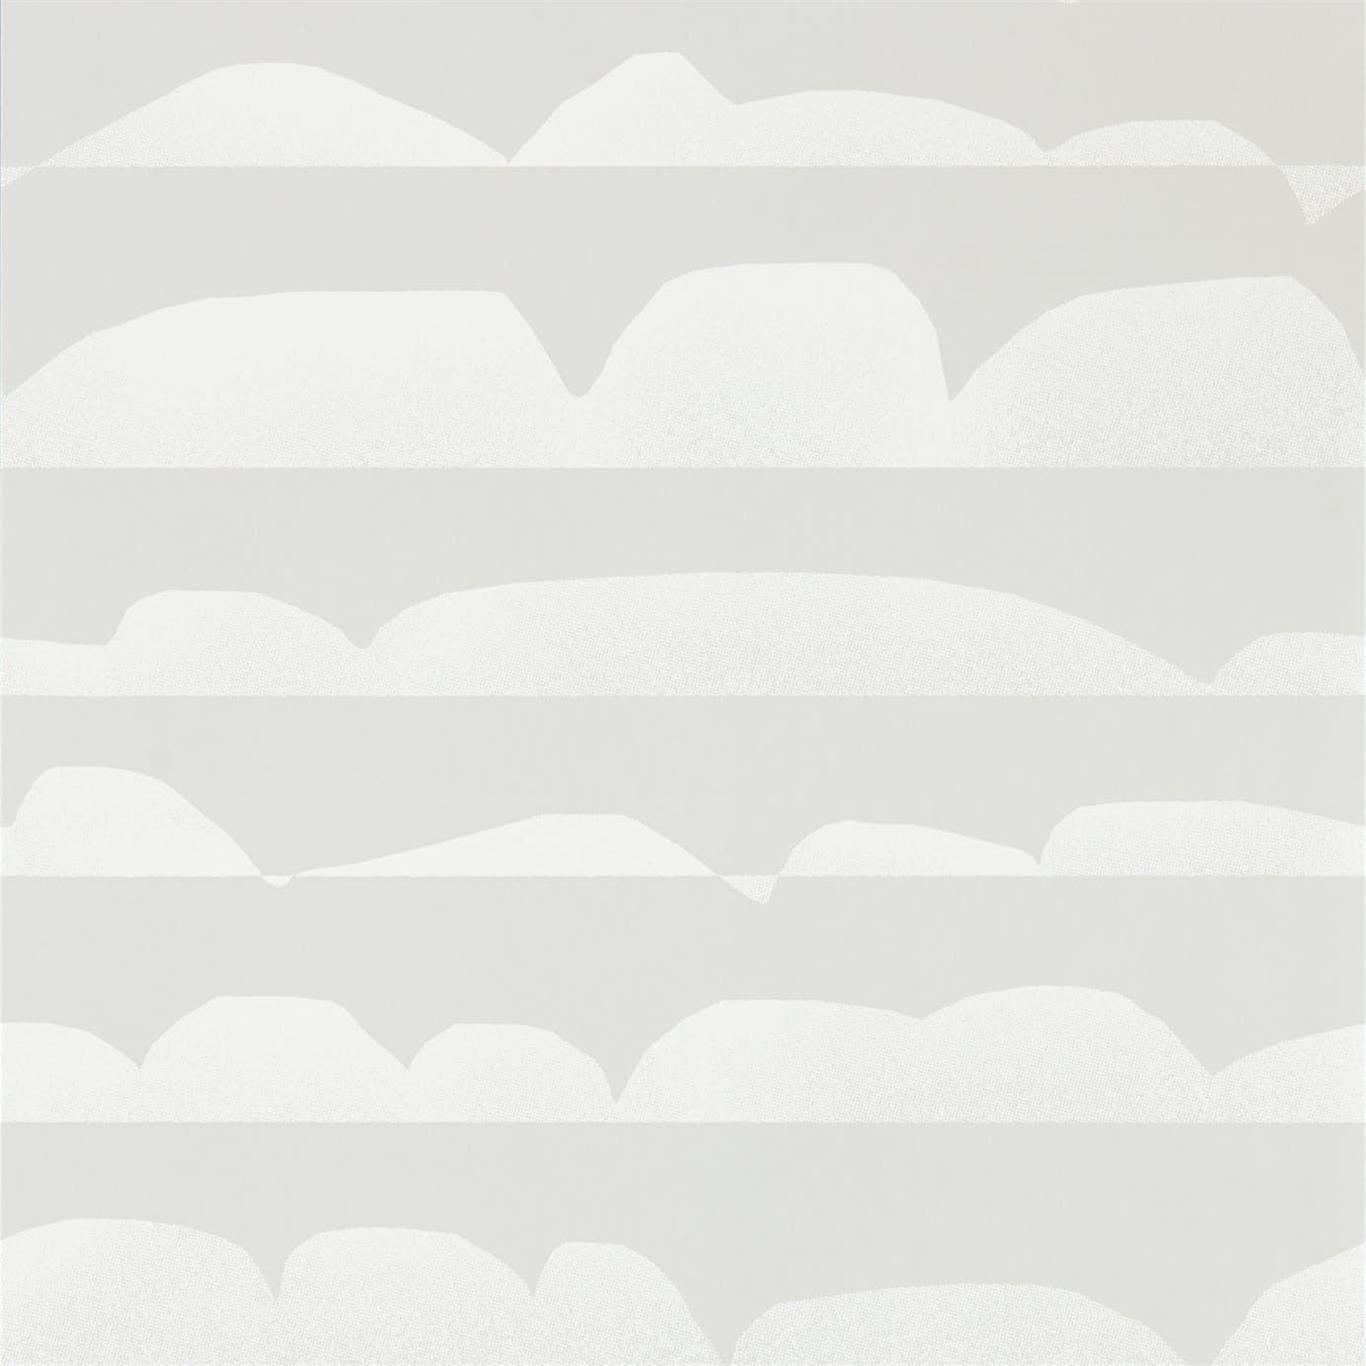 ОБОИ SCION ZANZIBAR арт. 112009